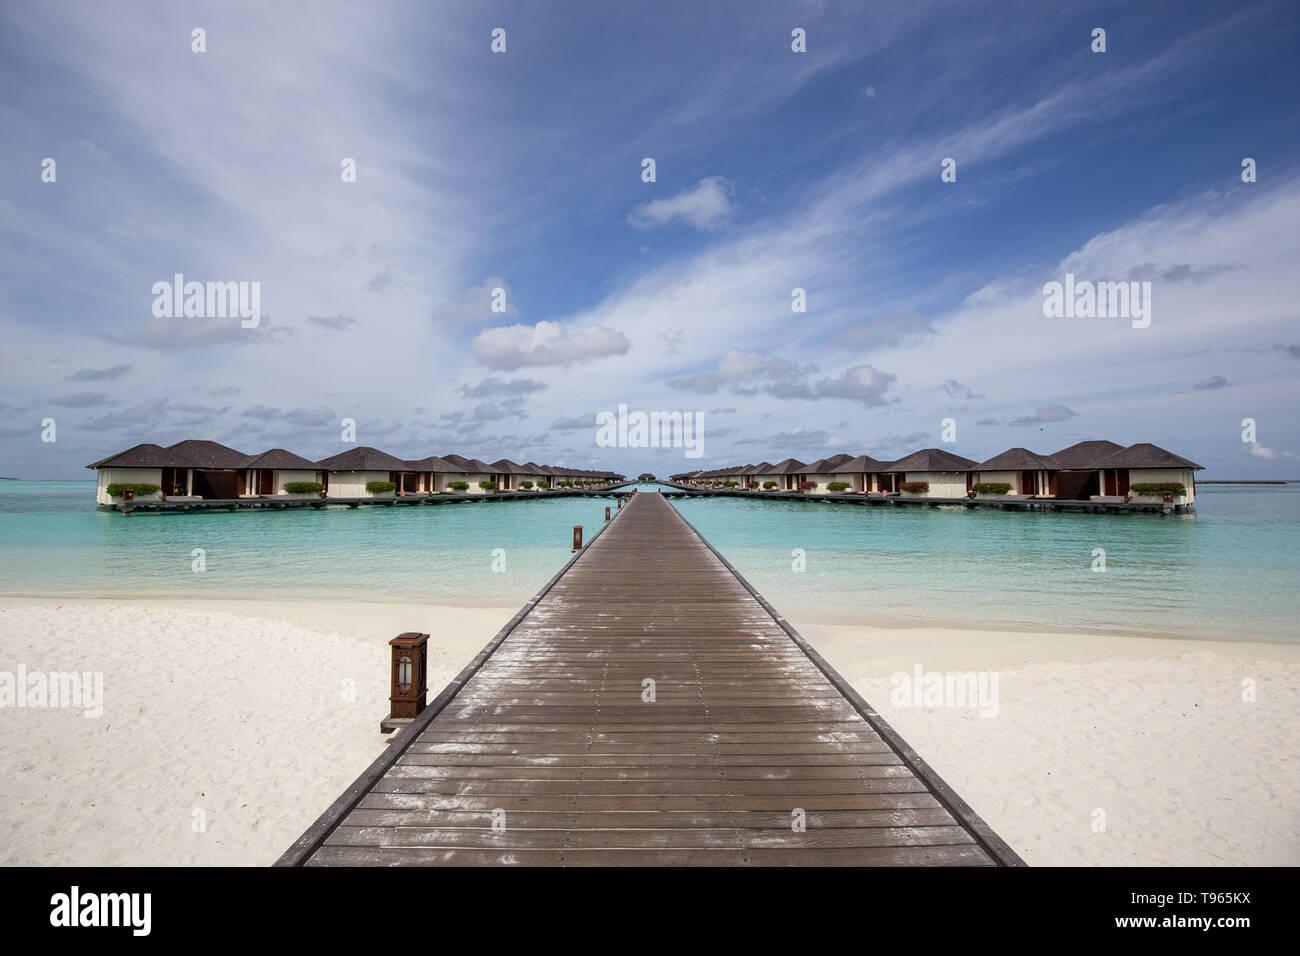 Maldives Paradise Island Resort Villas Stock Photo